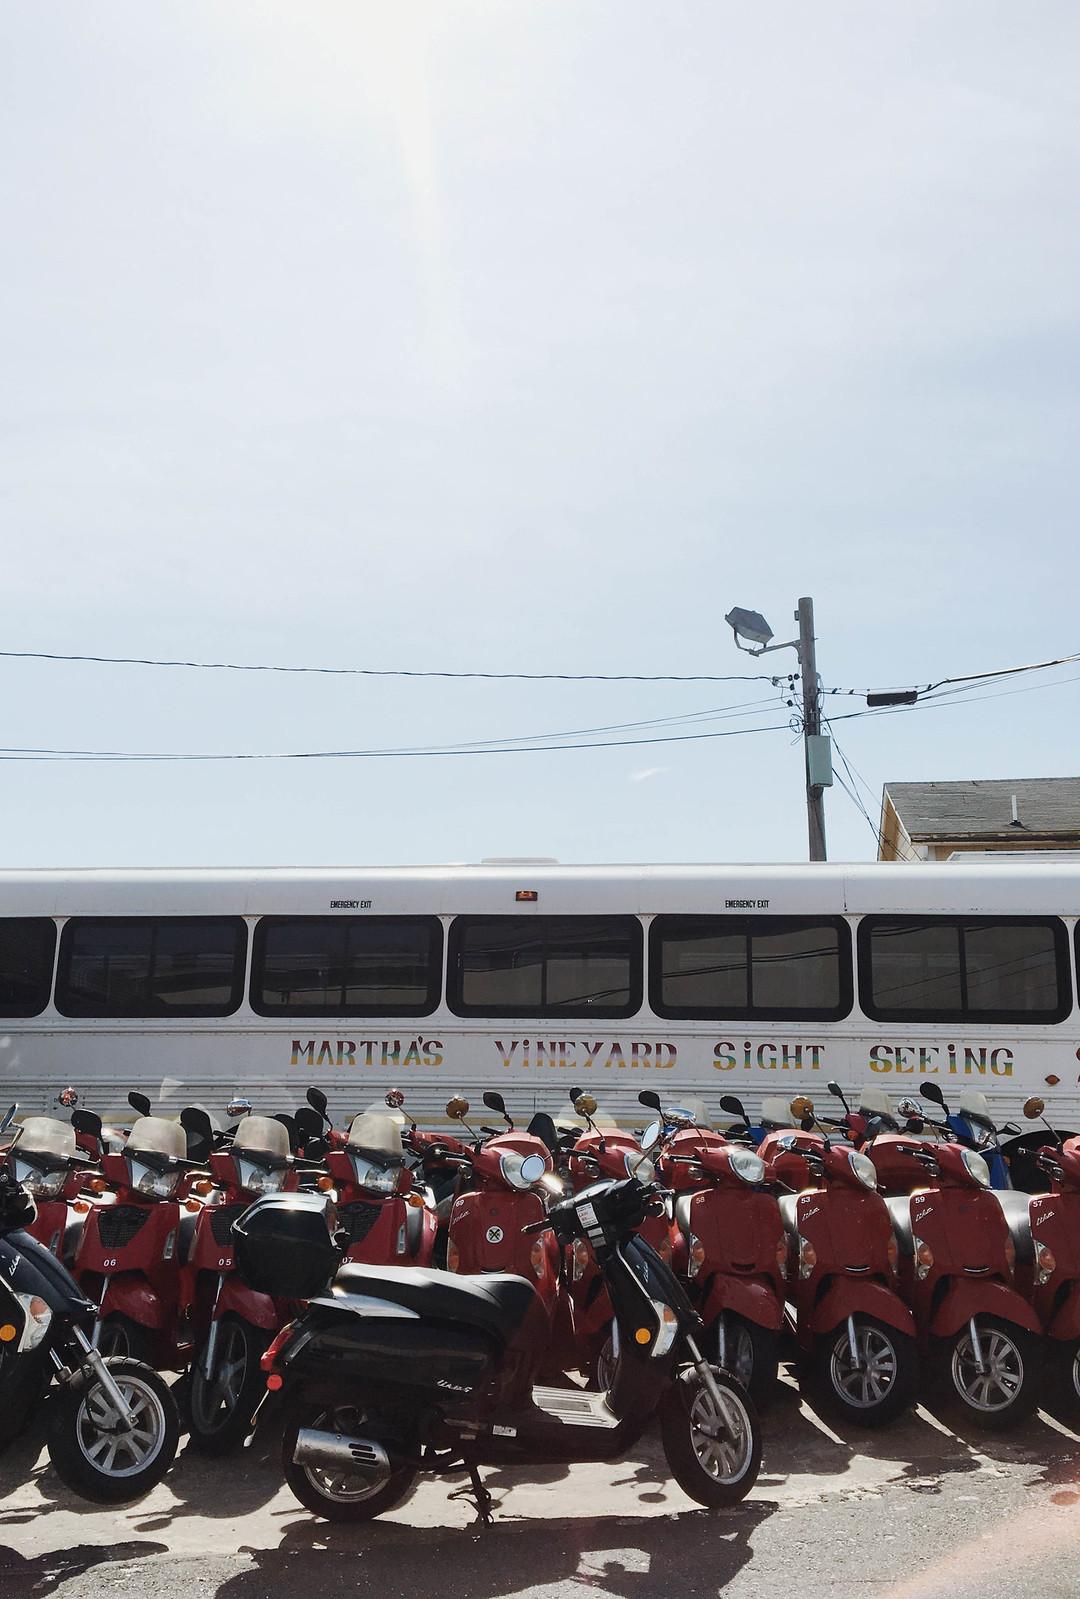 Marthas Vineyard Moped Rental on http://juliettelaura.blogspot.com/